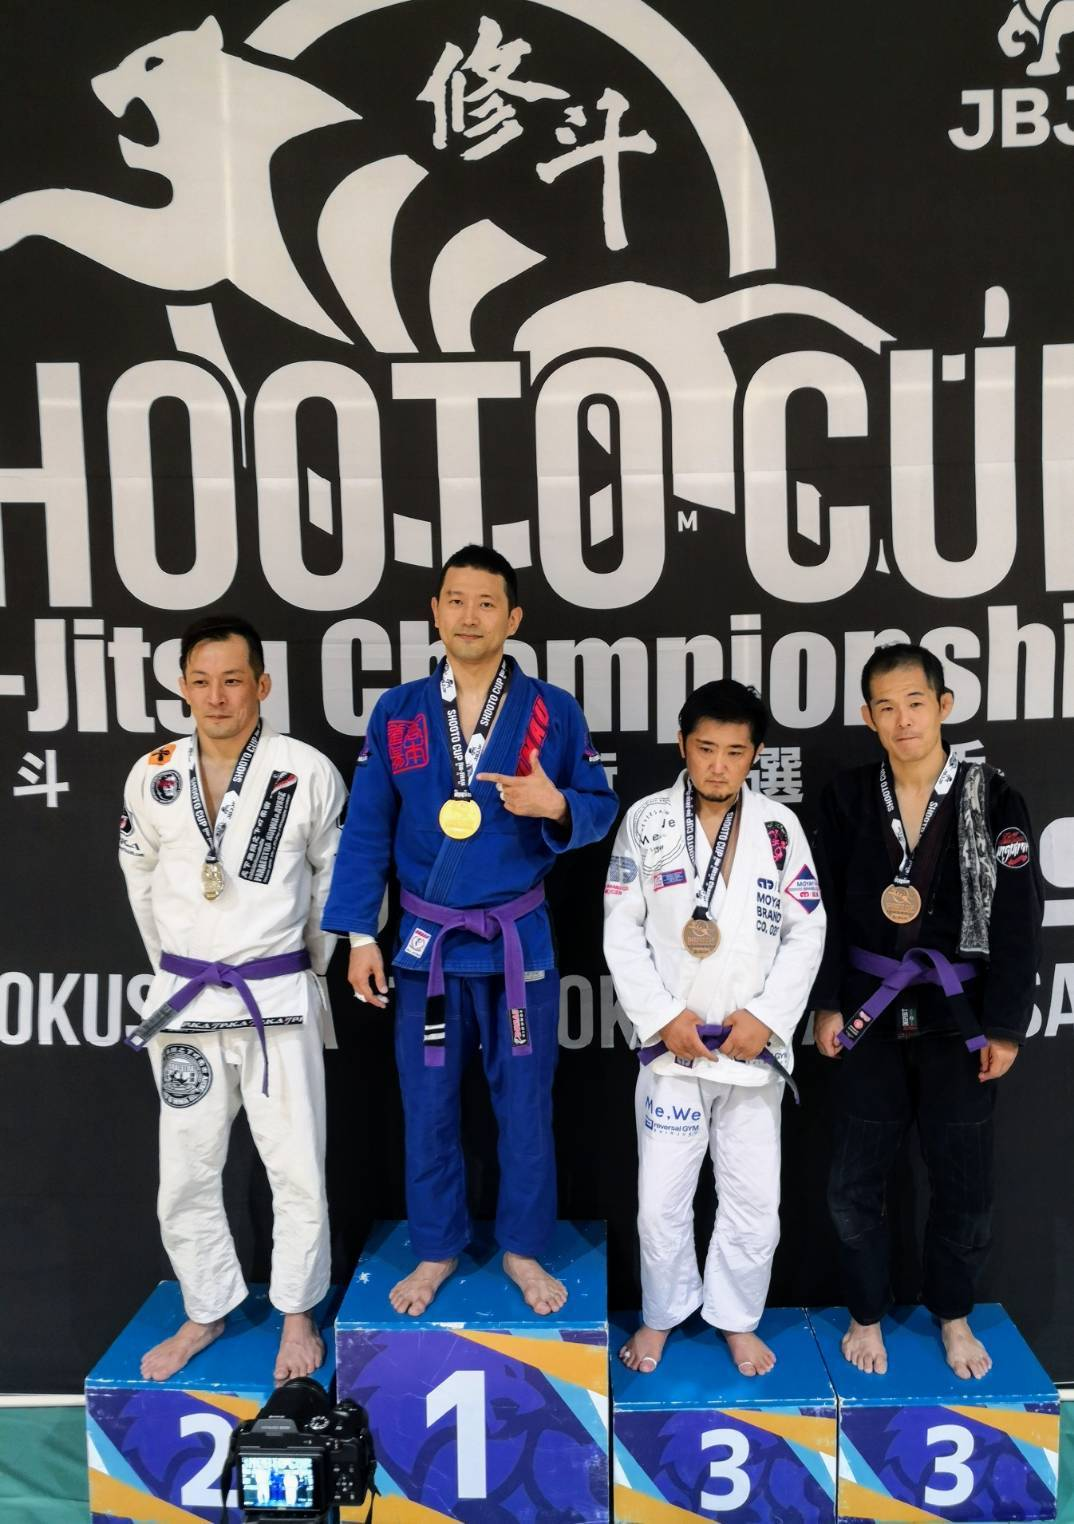 JBJJF 修斗杯柔術選手権2019関東|大会写真